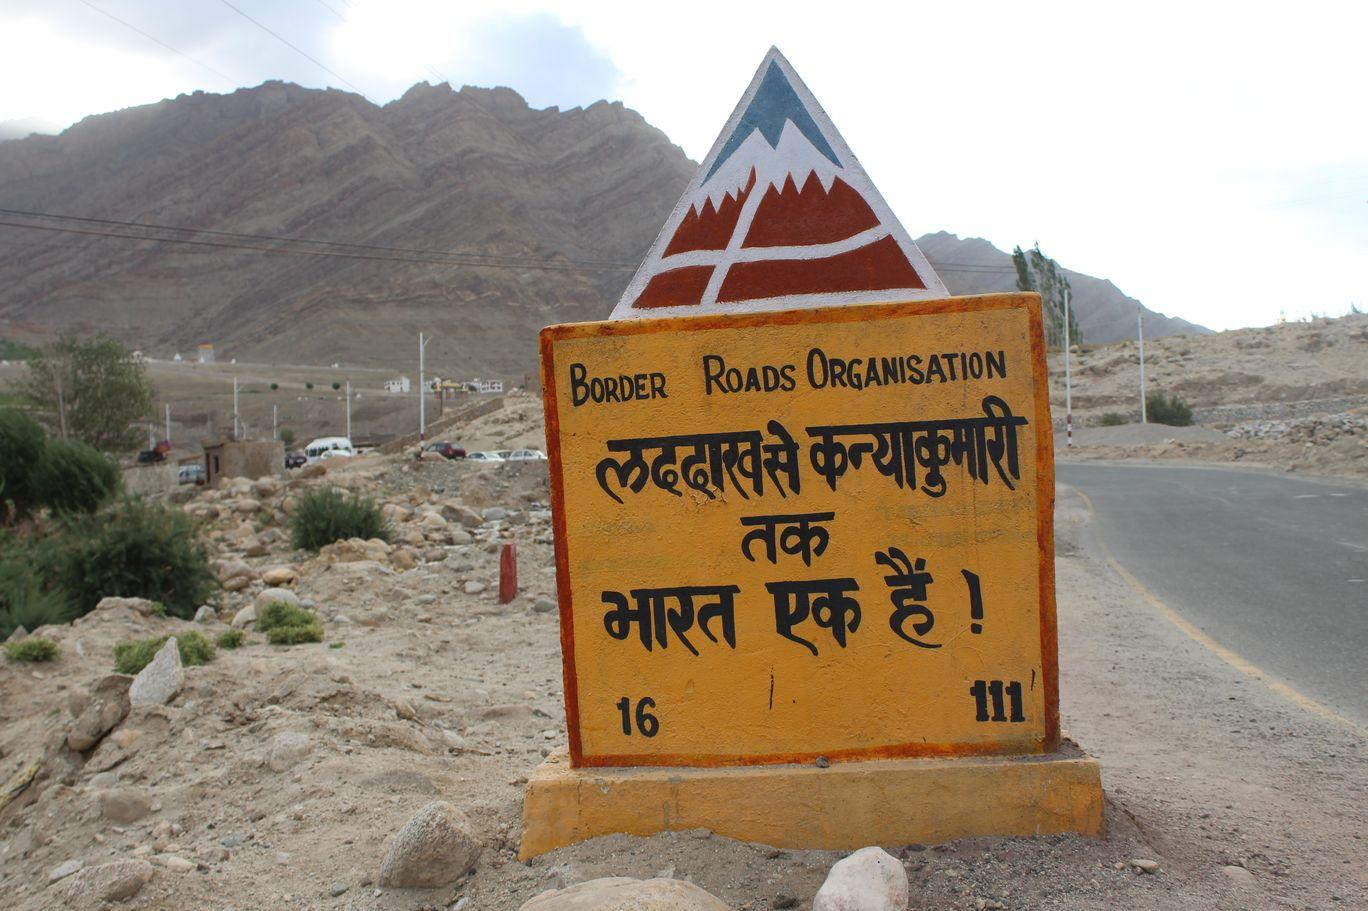 Photo of Leh Ladakh Tourism By Kanchan Hansrajani